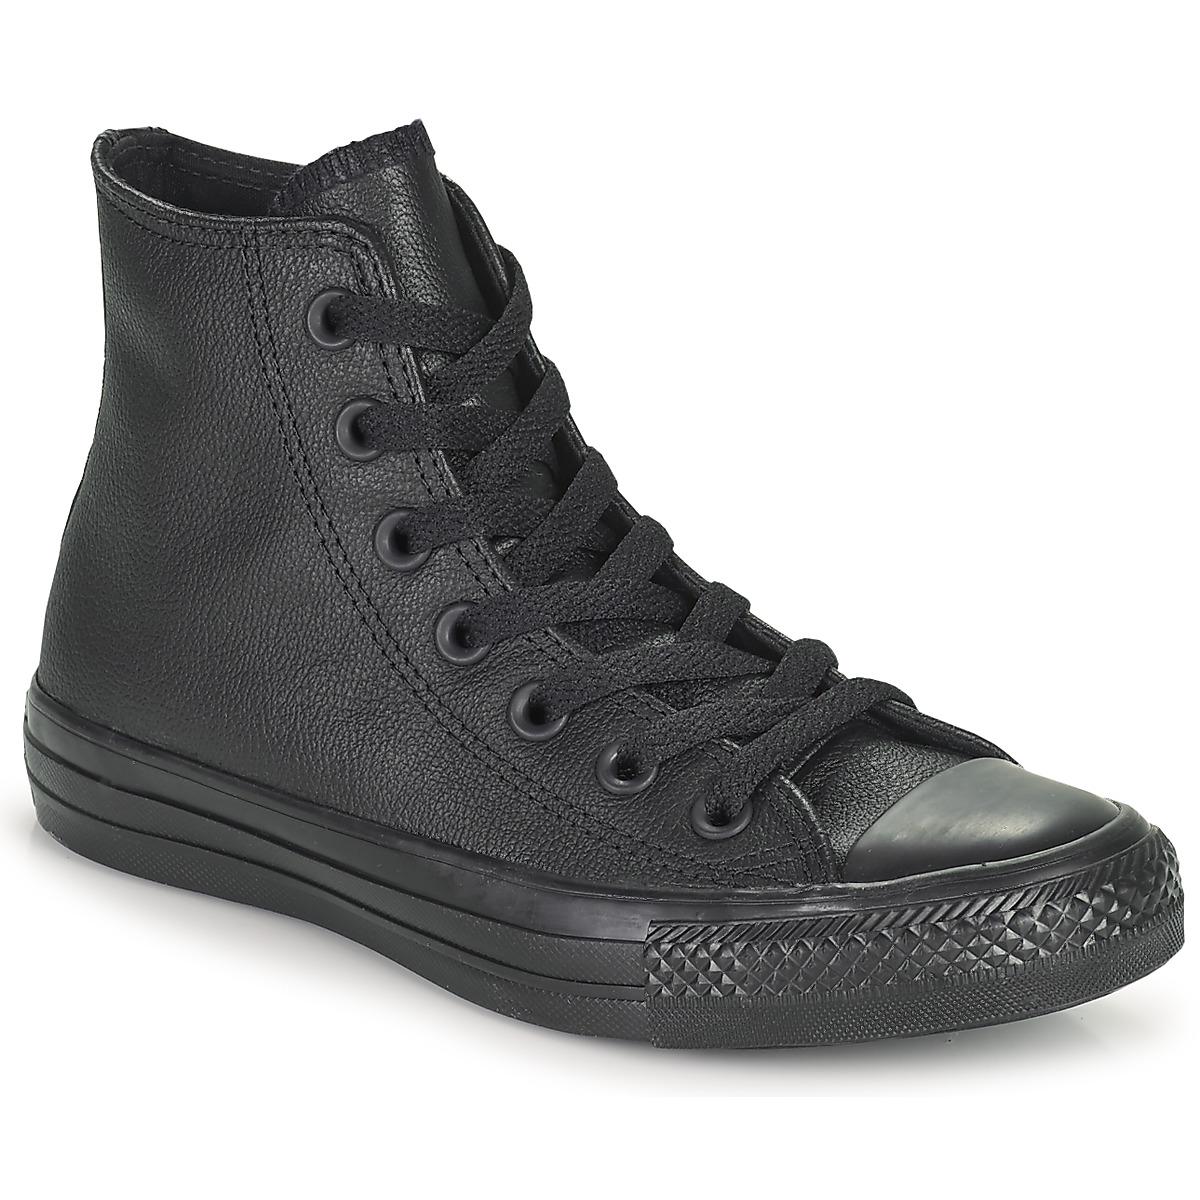 Converse CHUCK TAYLOR ALL STAR MONO HI Schwarz - Kostenloser Versand bei Spartoode ! - Schuhe Sneaker High  71,99 €